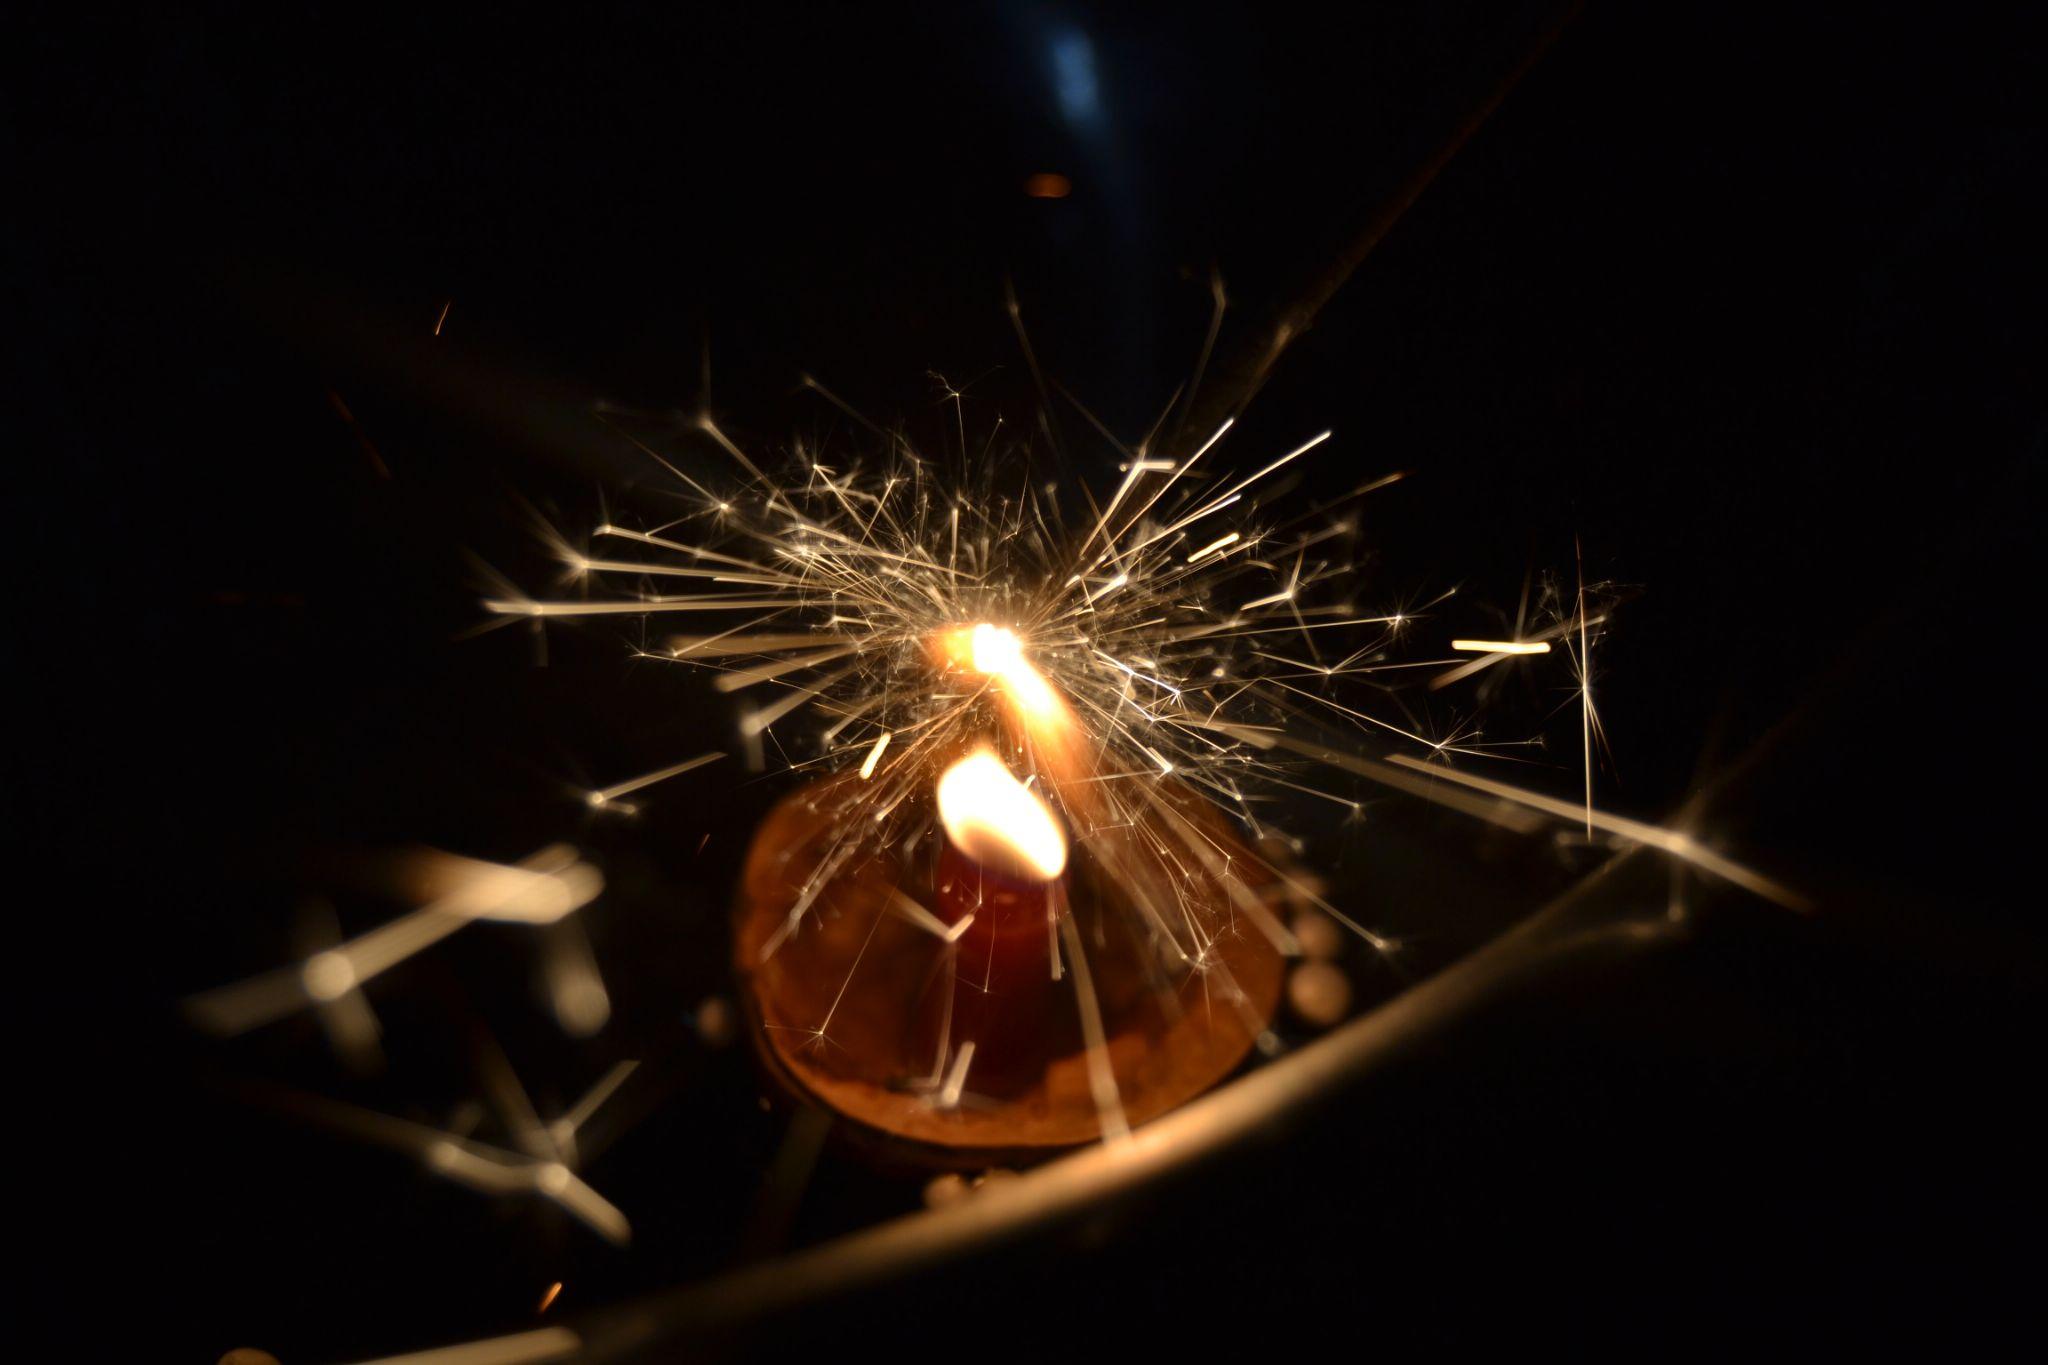 Candle by michaela.novakova.3760